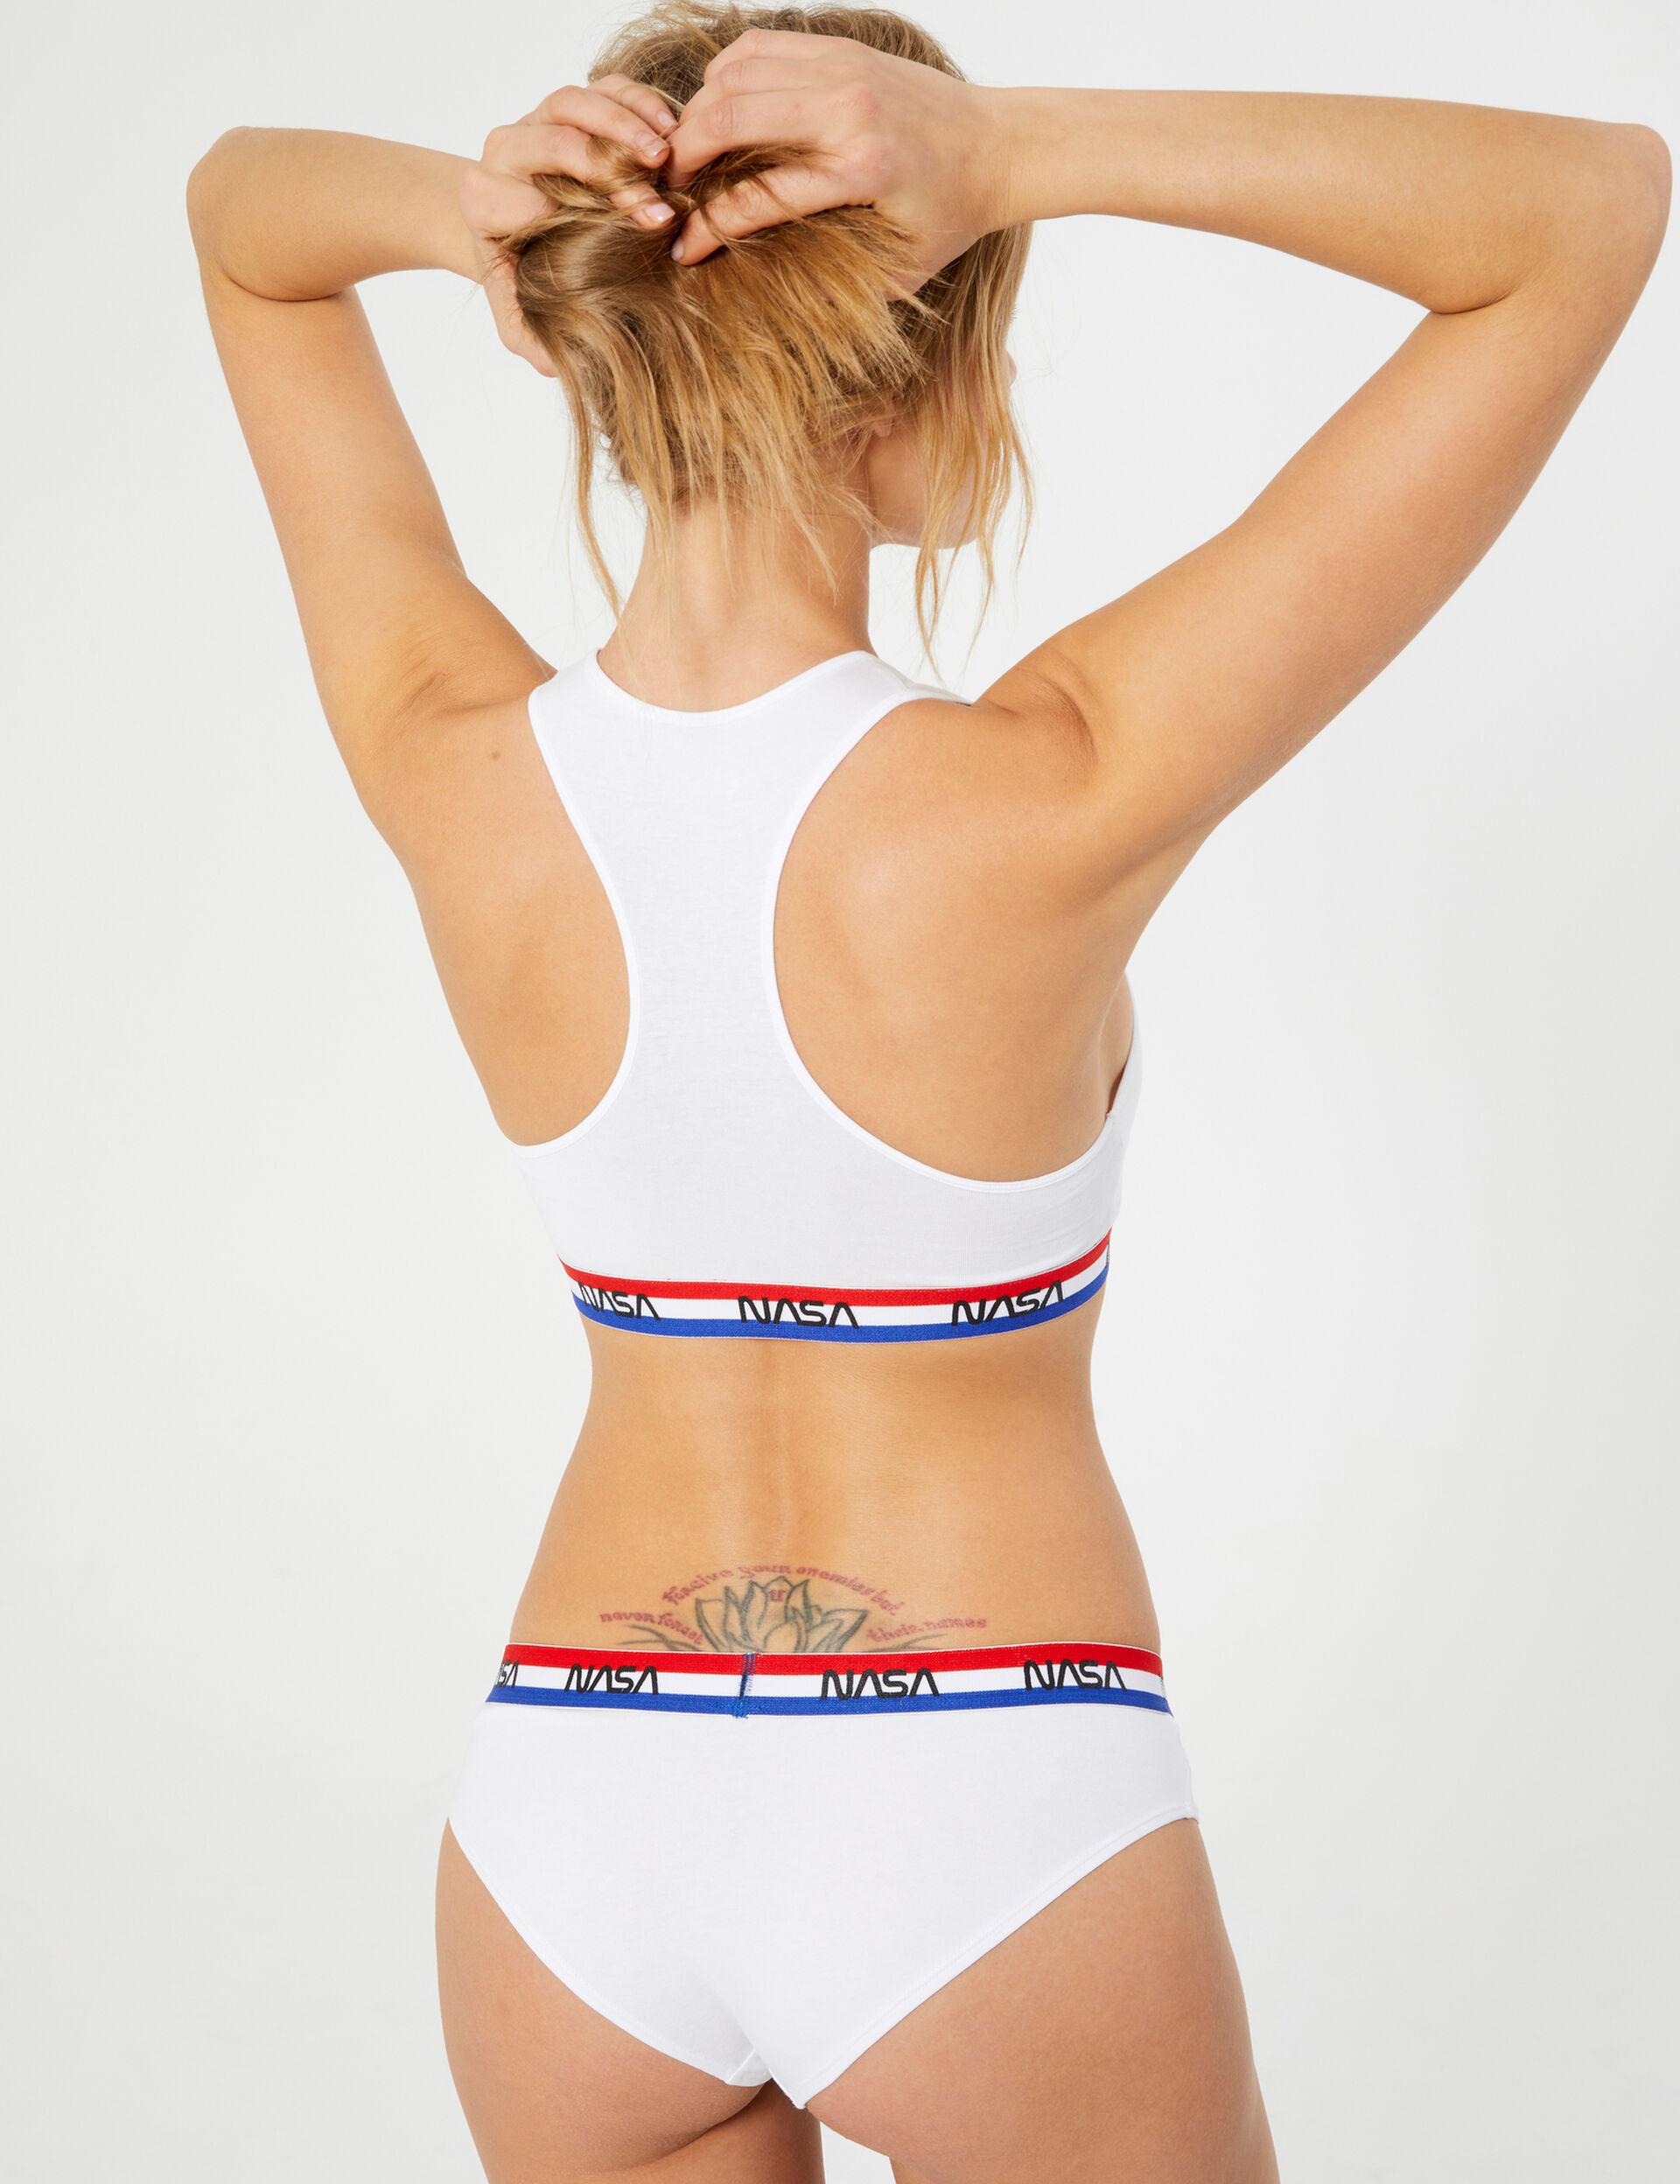 NASA three-tone bra top